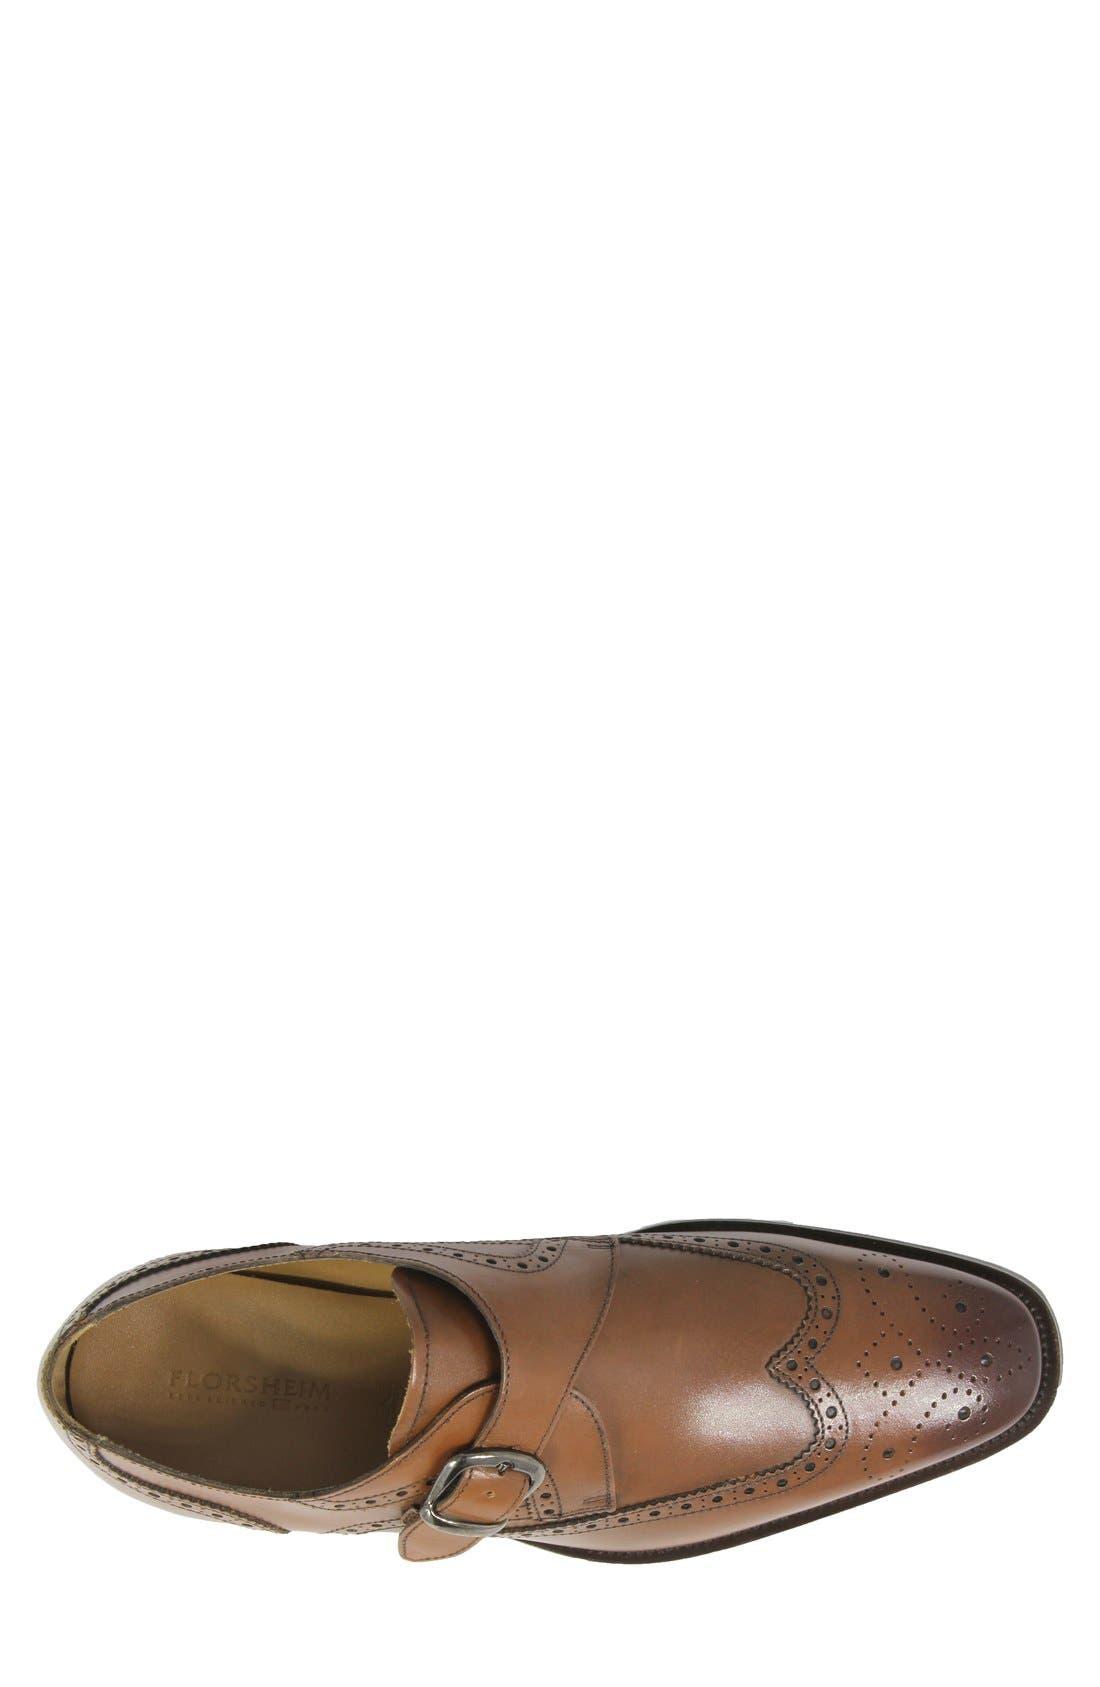 FLORSHEIM, 'Sabato' Wingtip Monk Strap Shoe, Alternate thumbnail 3, color, MEDIUM BROWN